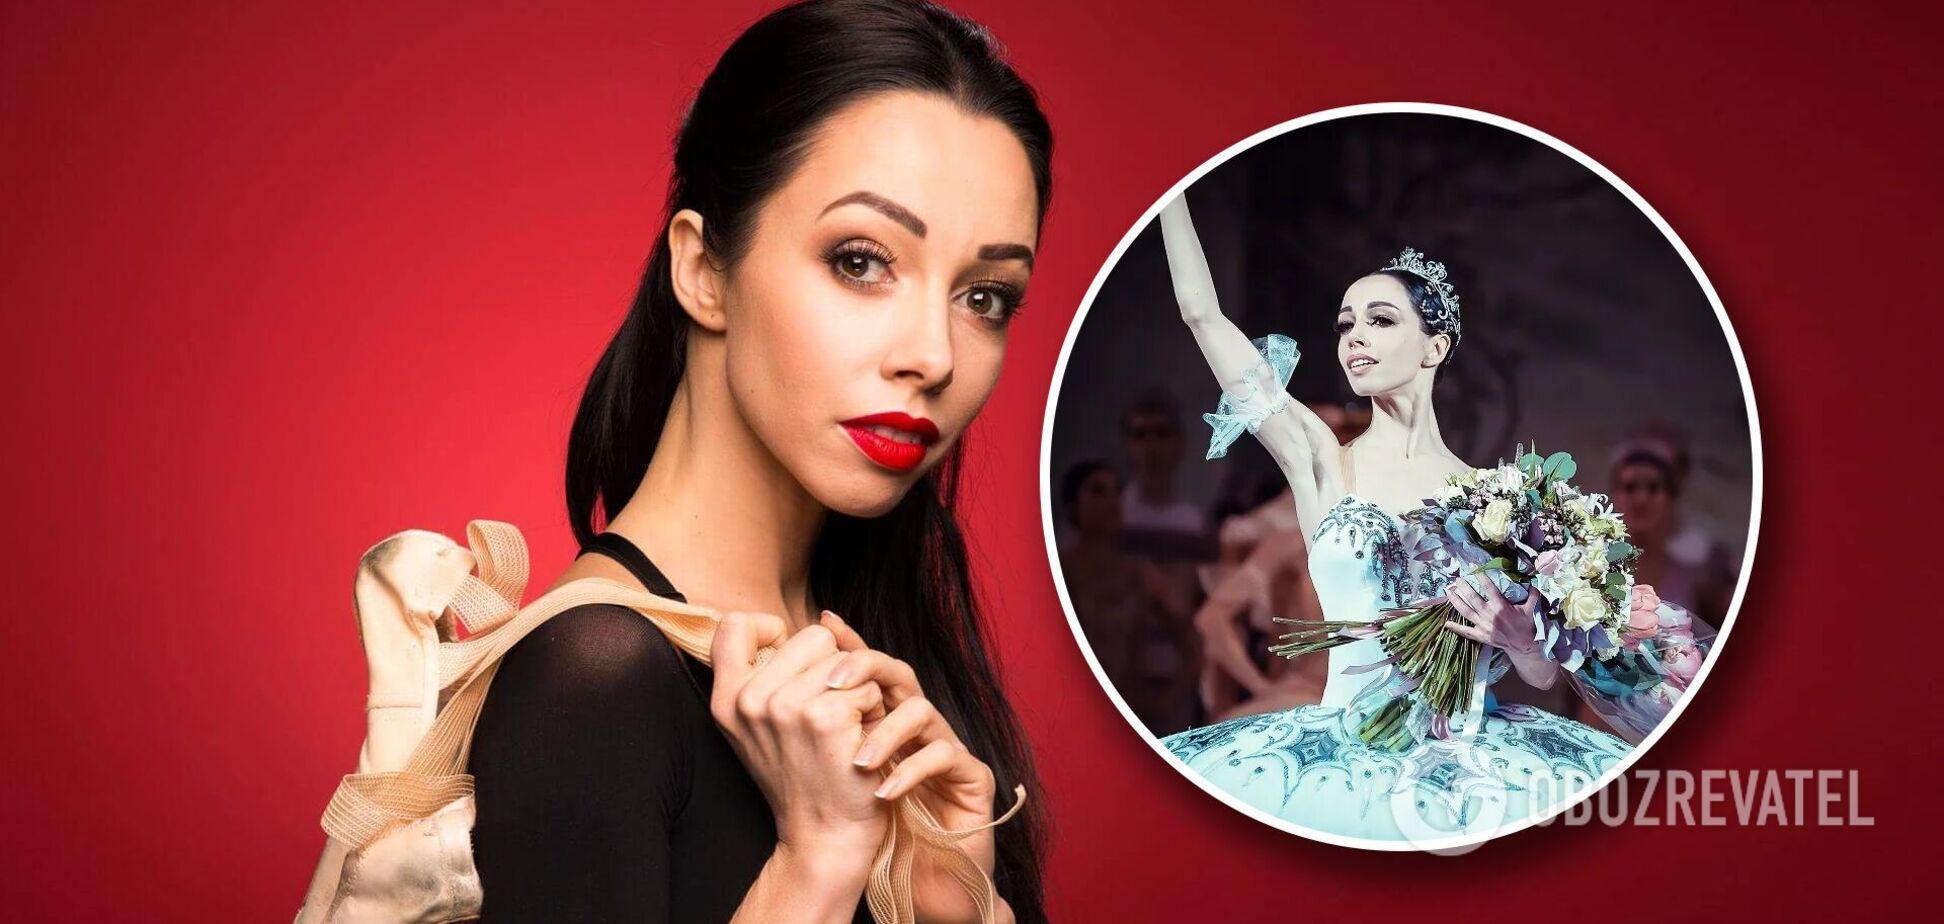 Кухар о скандалах на 'Танцях з зірками': когда танец заканчивается, мнение высказывает жюри